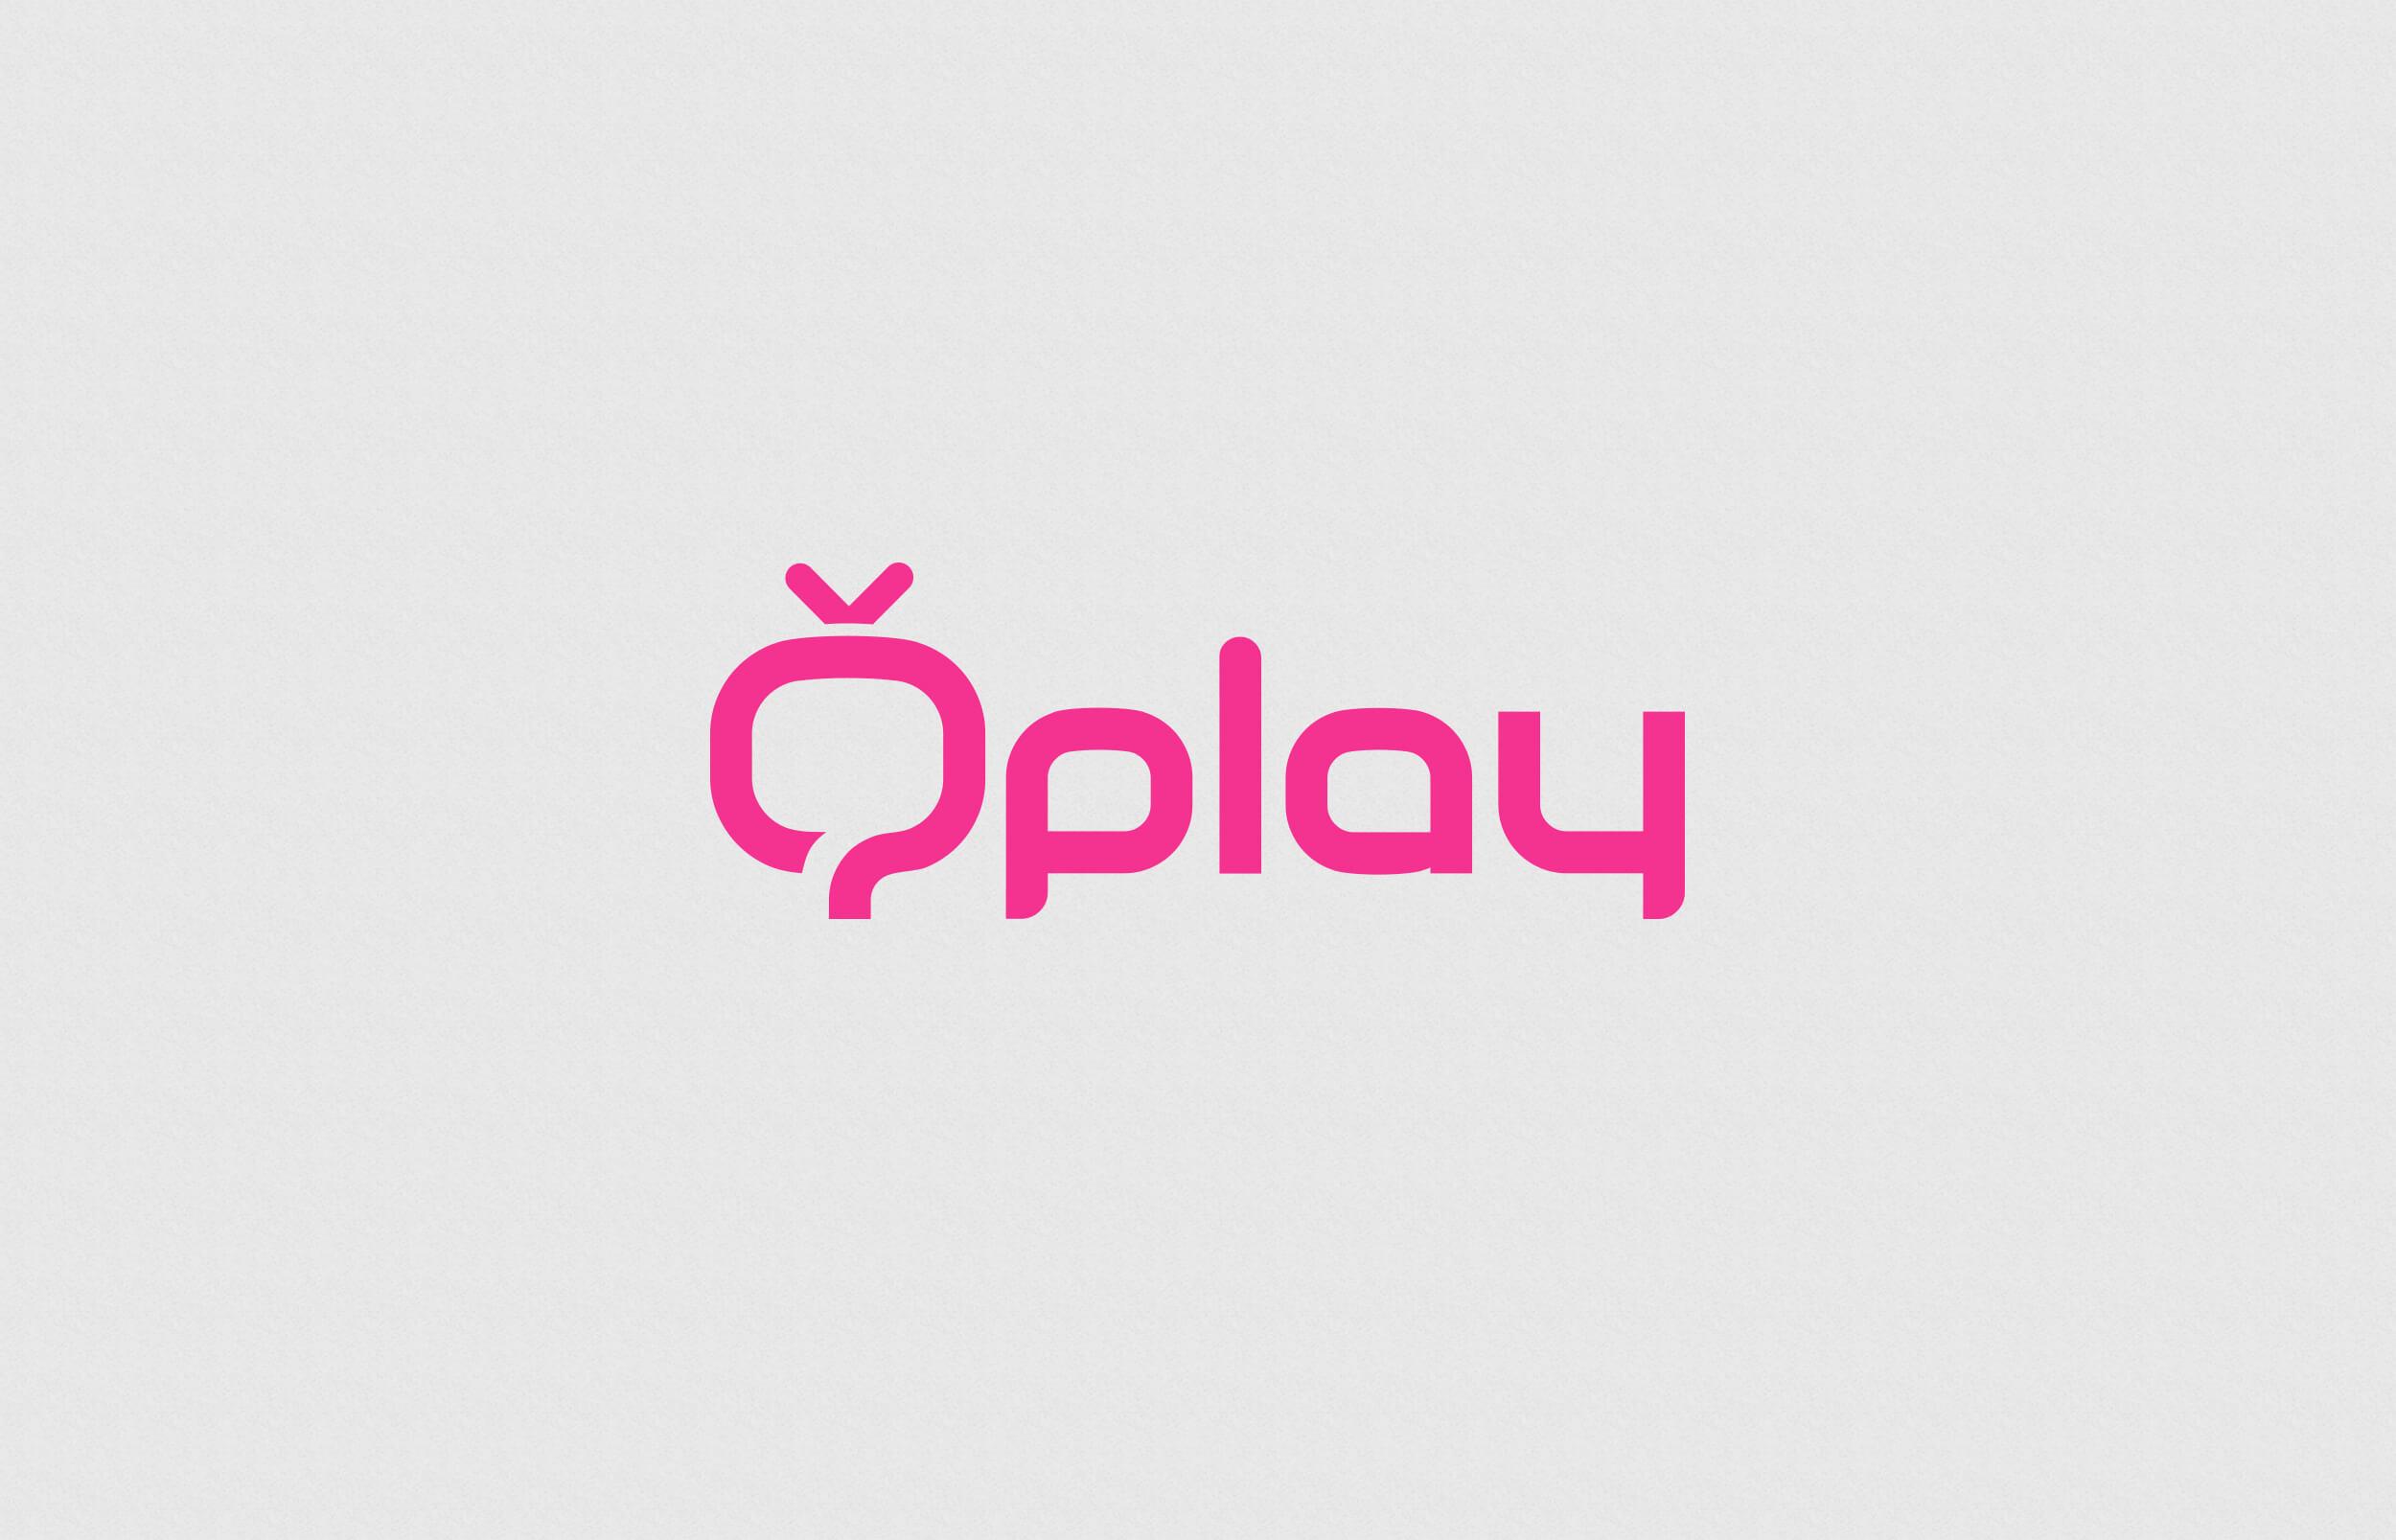 qplay-09.jpg